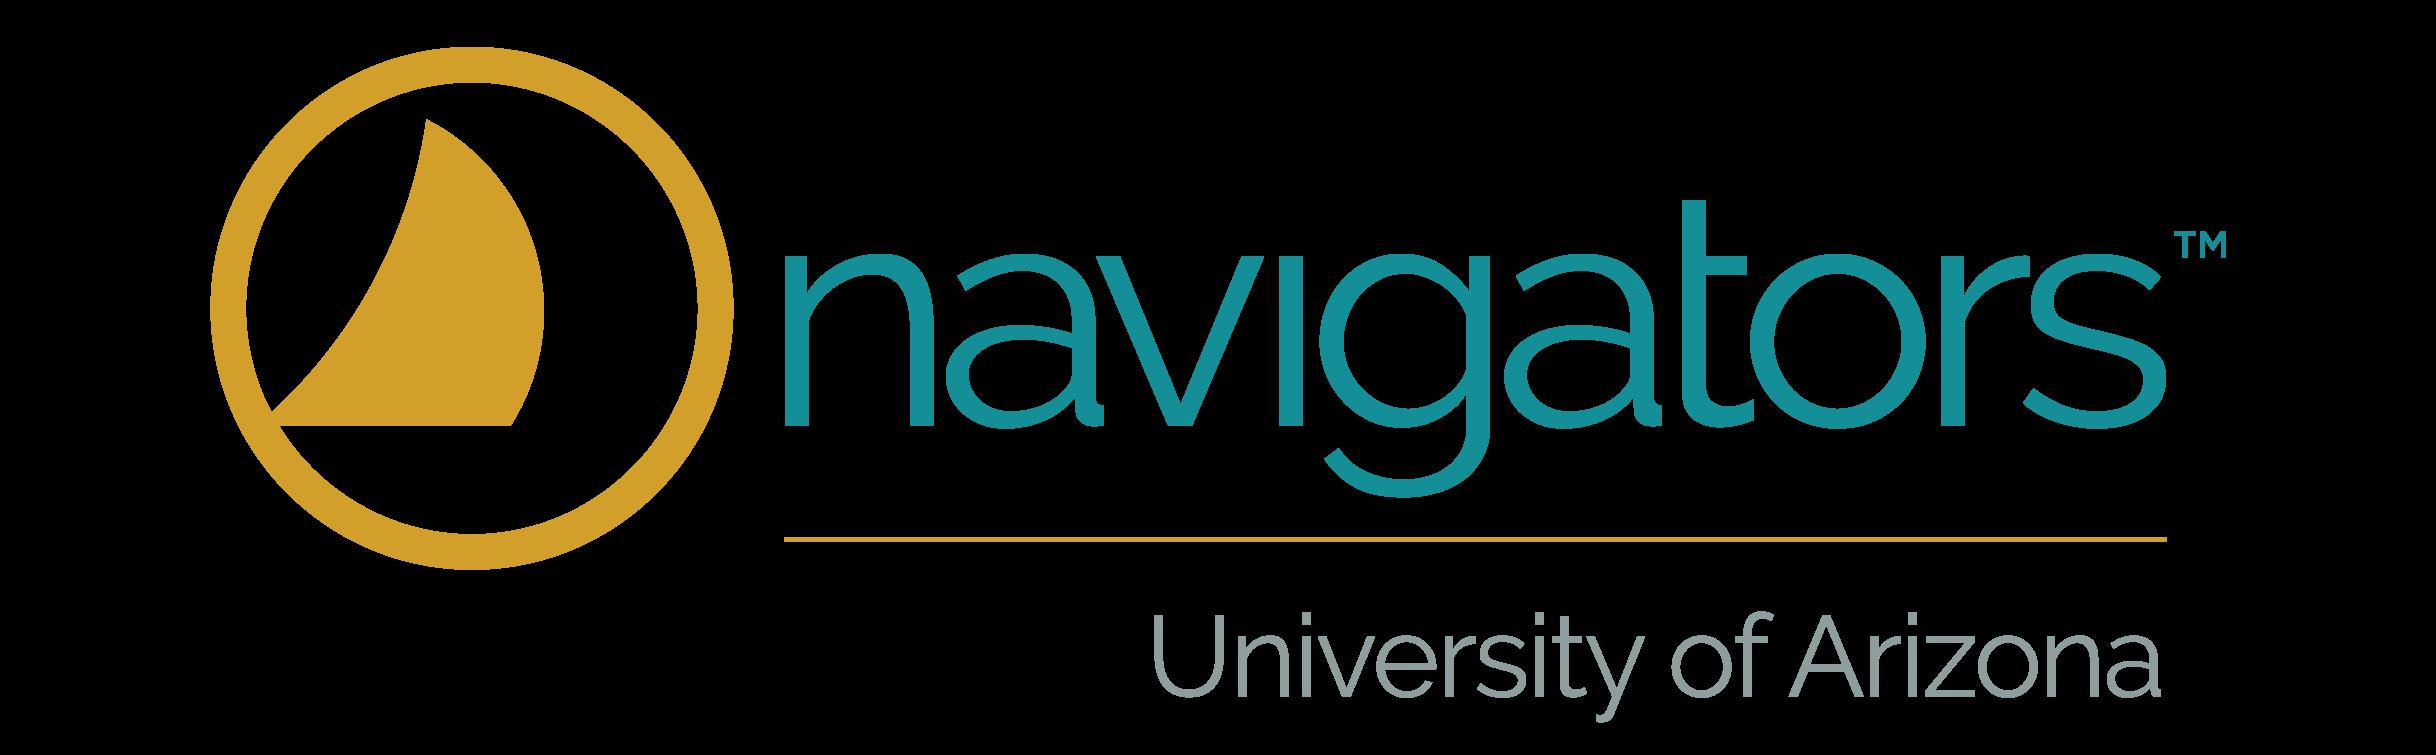 Navigators_Arizona_Color-Cropped